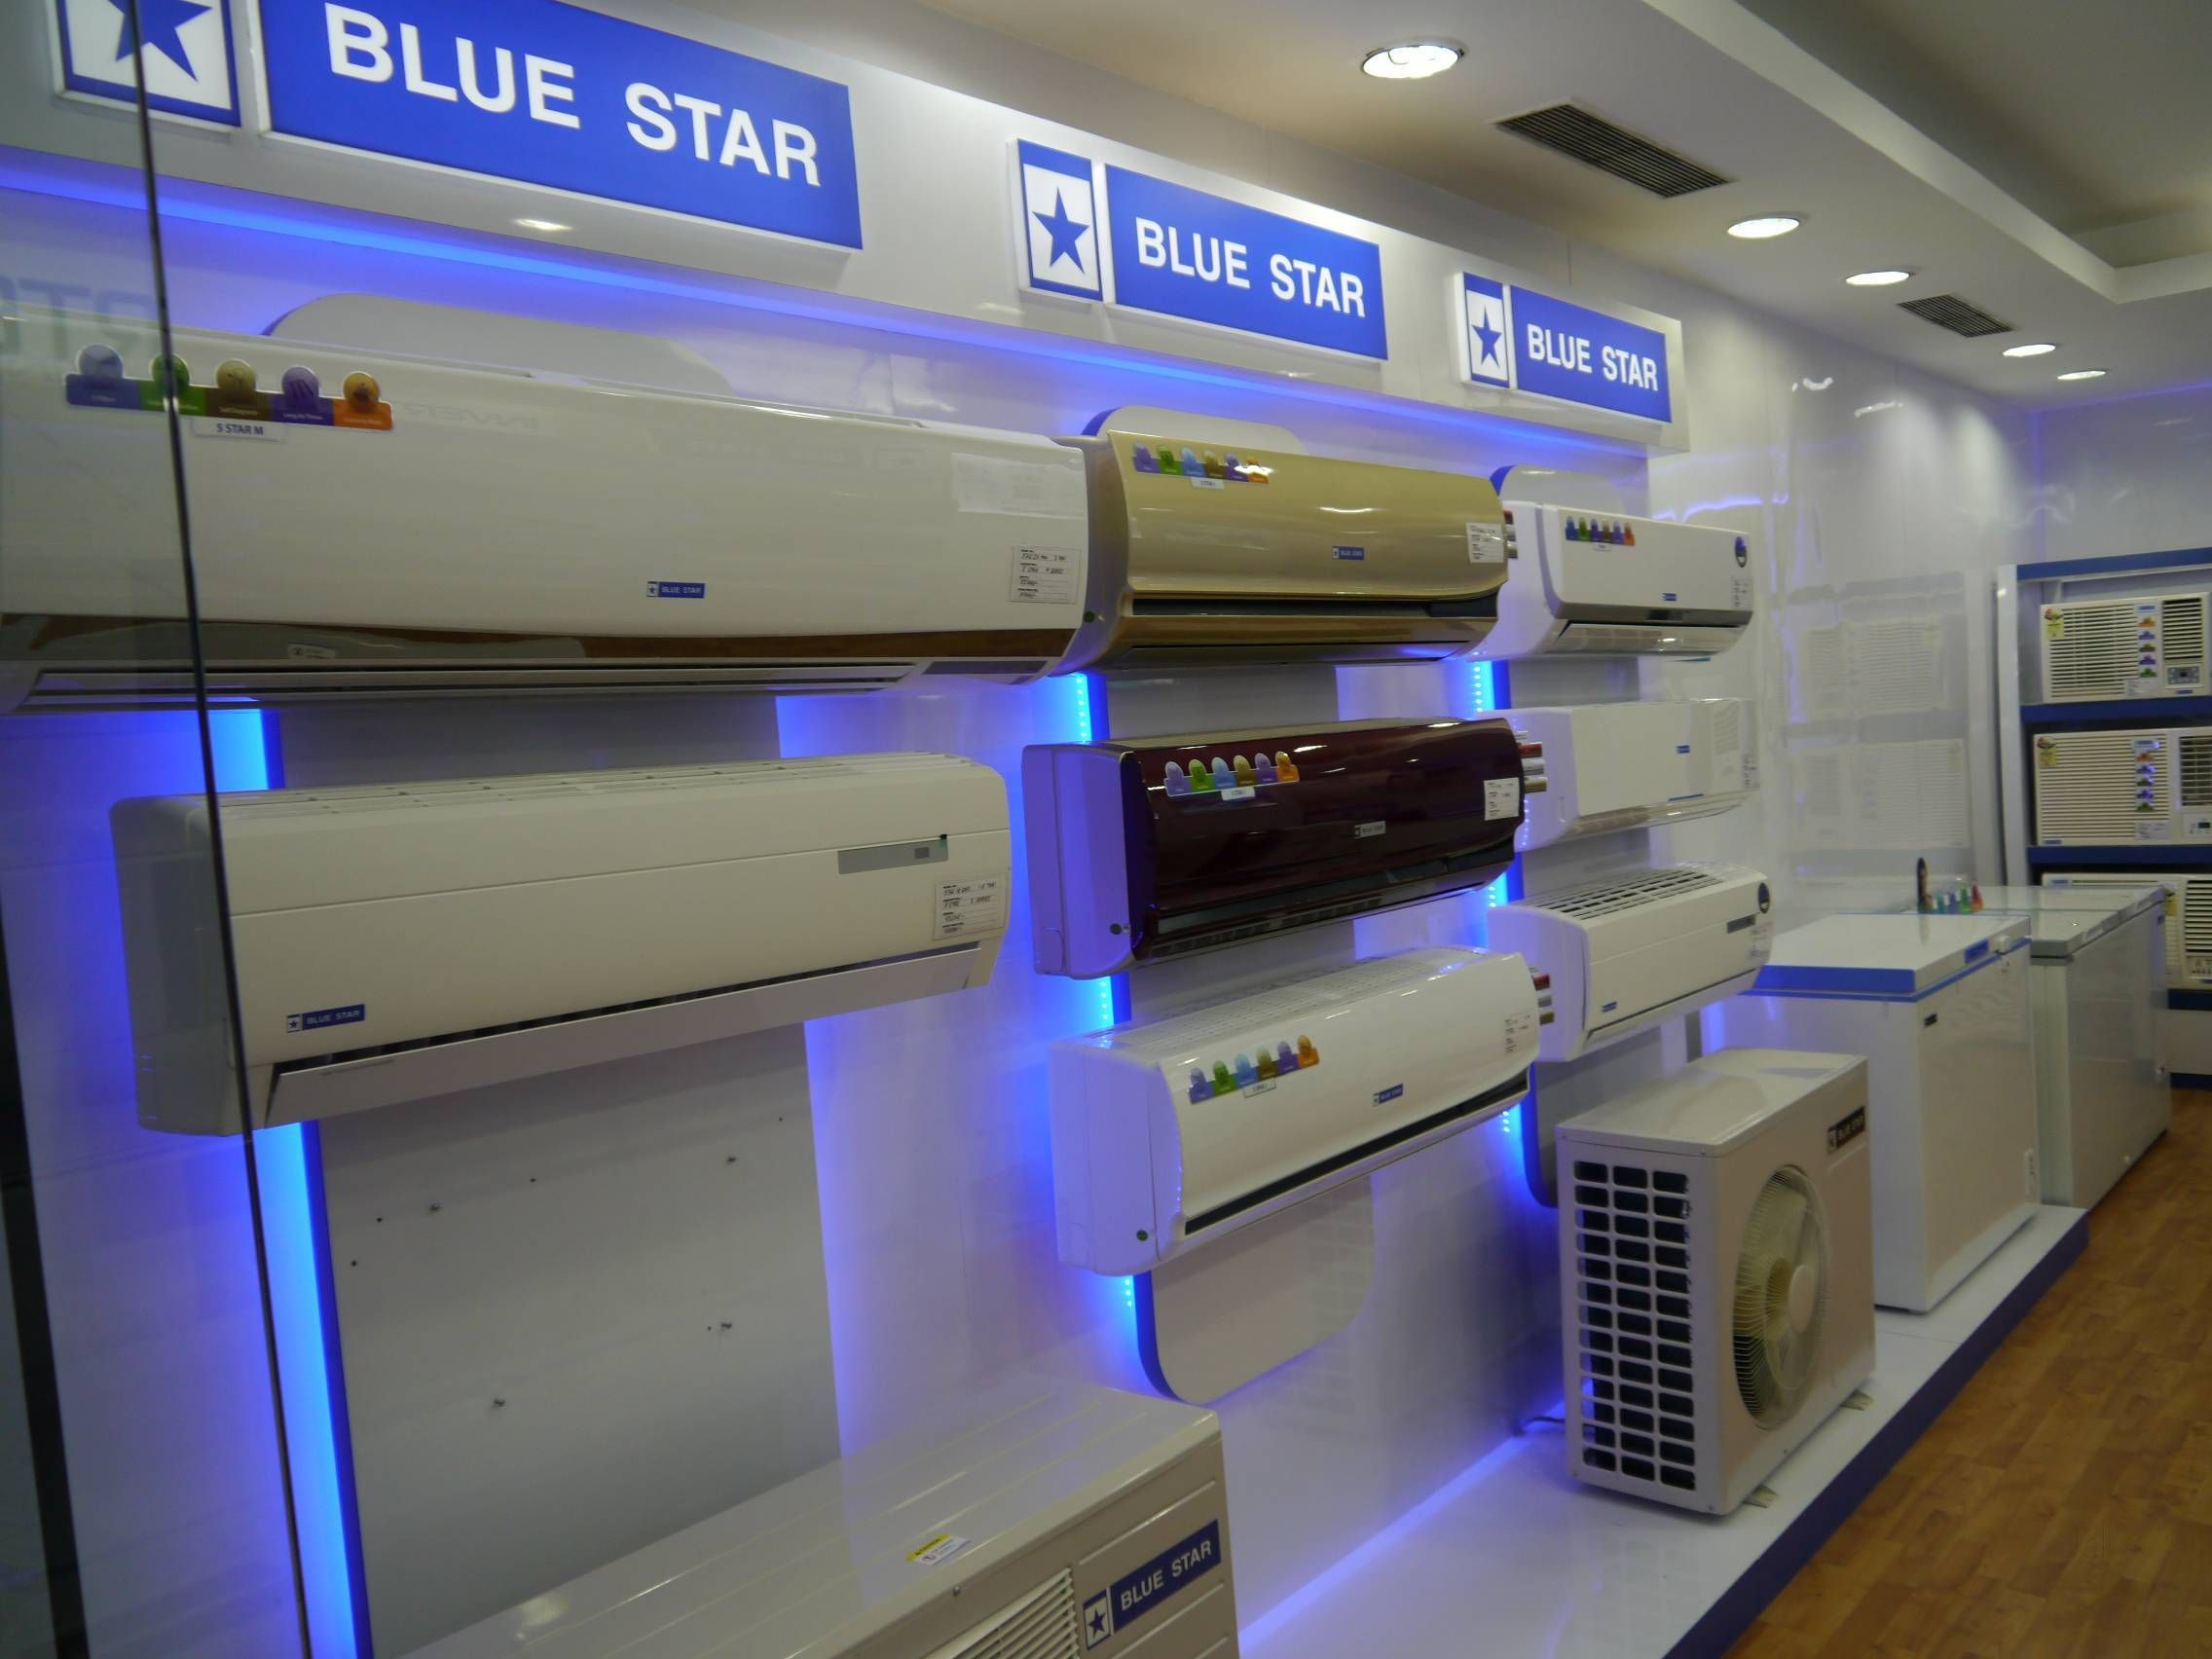 LG ac dealer,Hitachi ac dealer,Blue star ac,Samsung ac